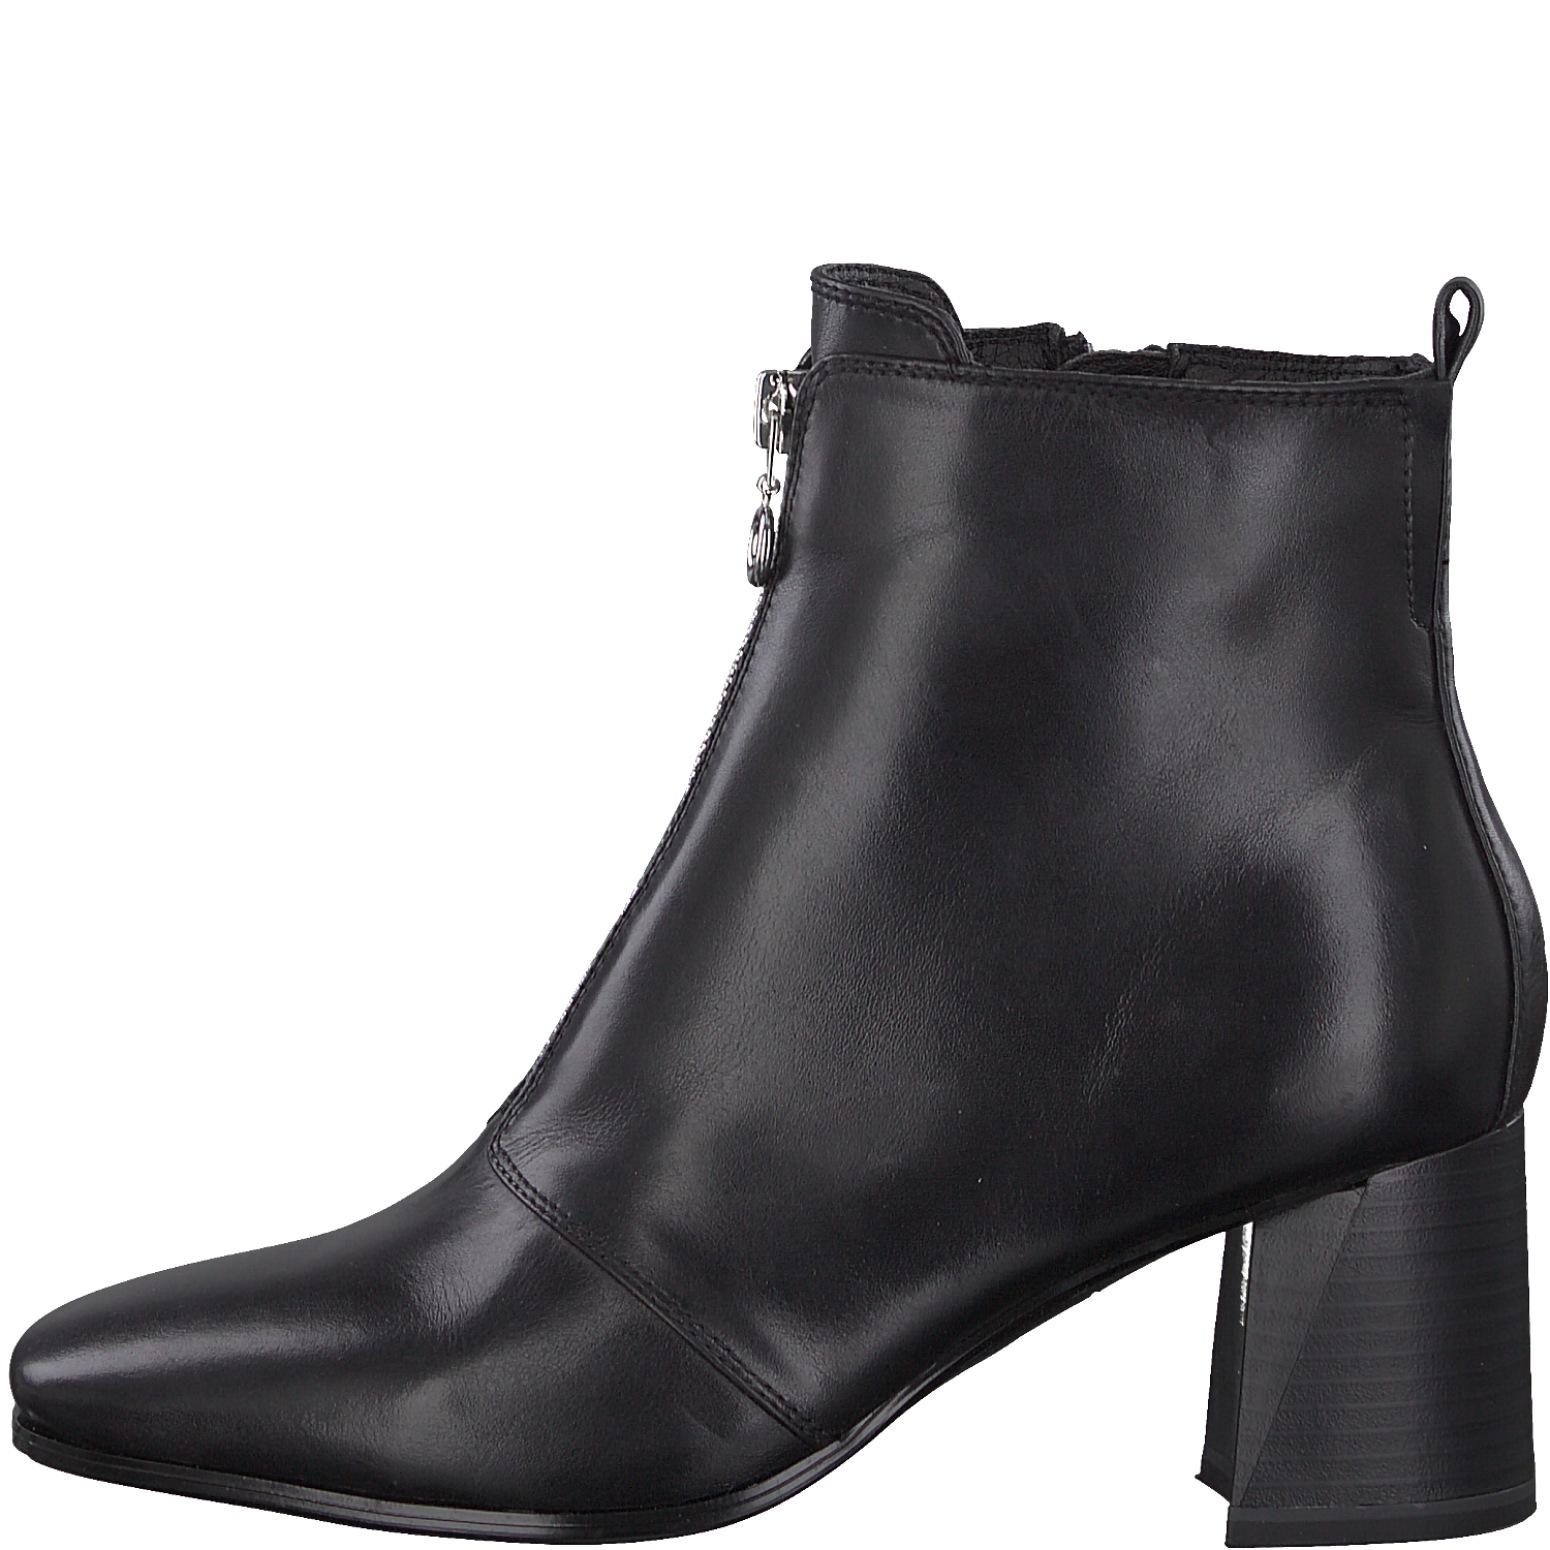 Tamaris Damen 1 25967 33 Stiefeletten Ankle Boots Leder